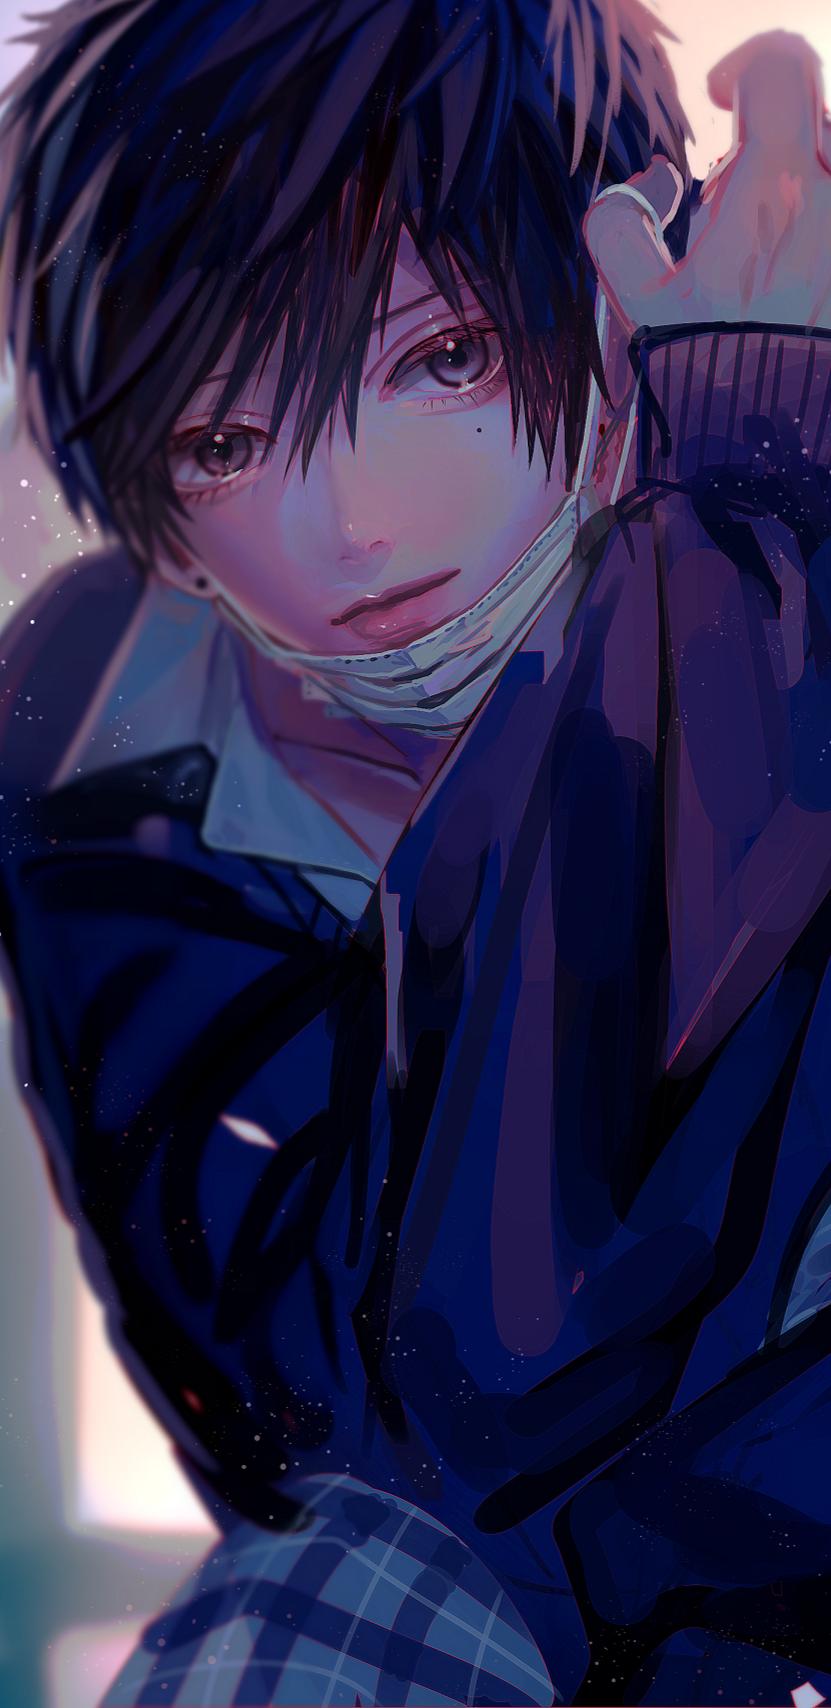 □ Illust of logA